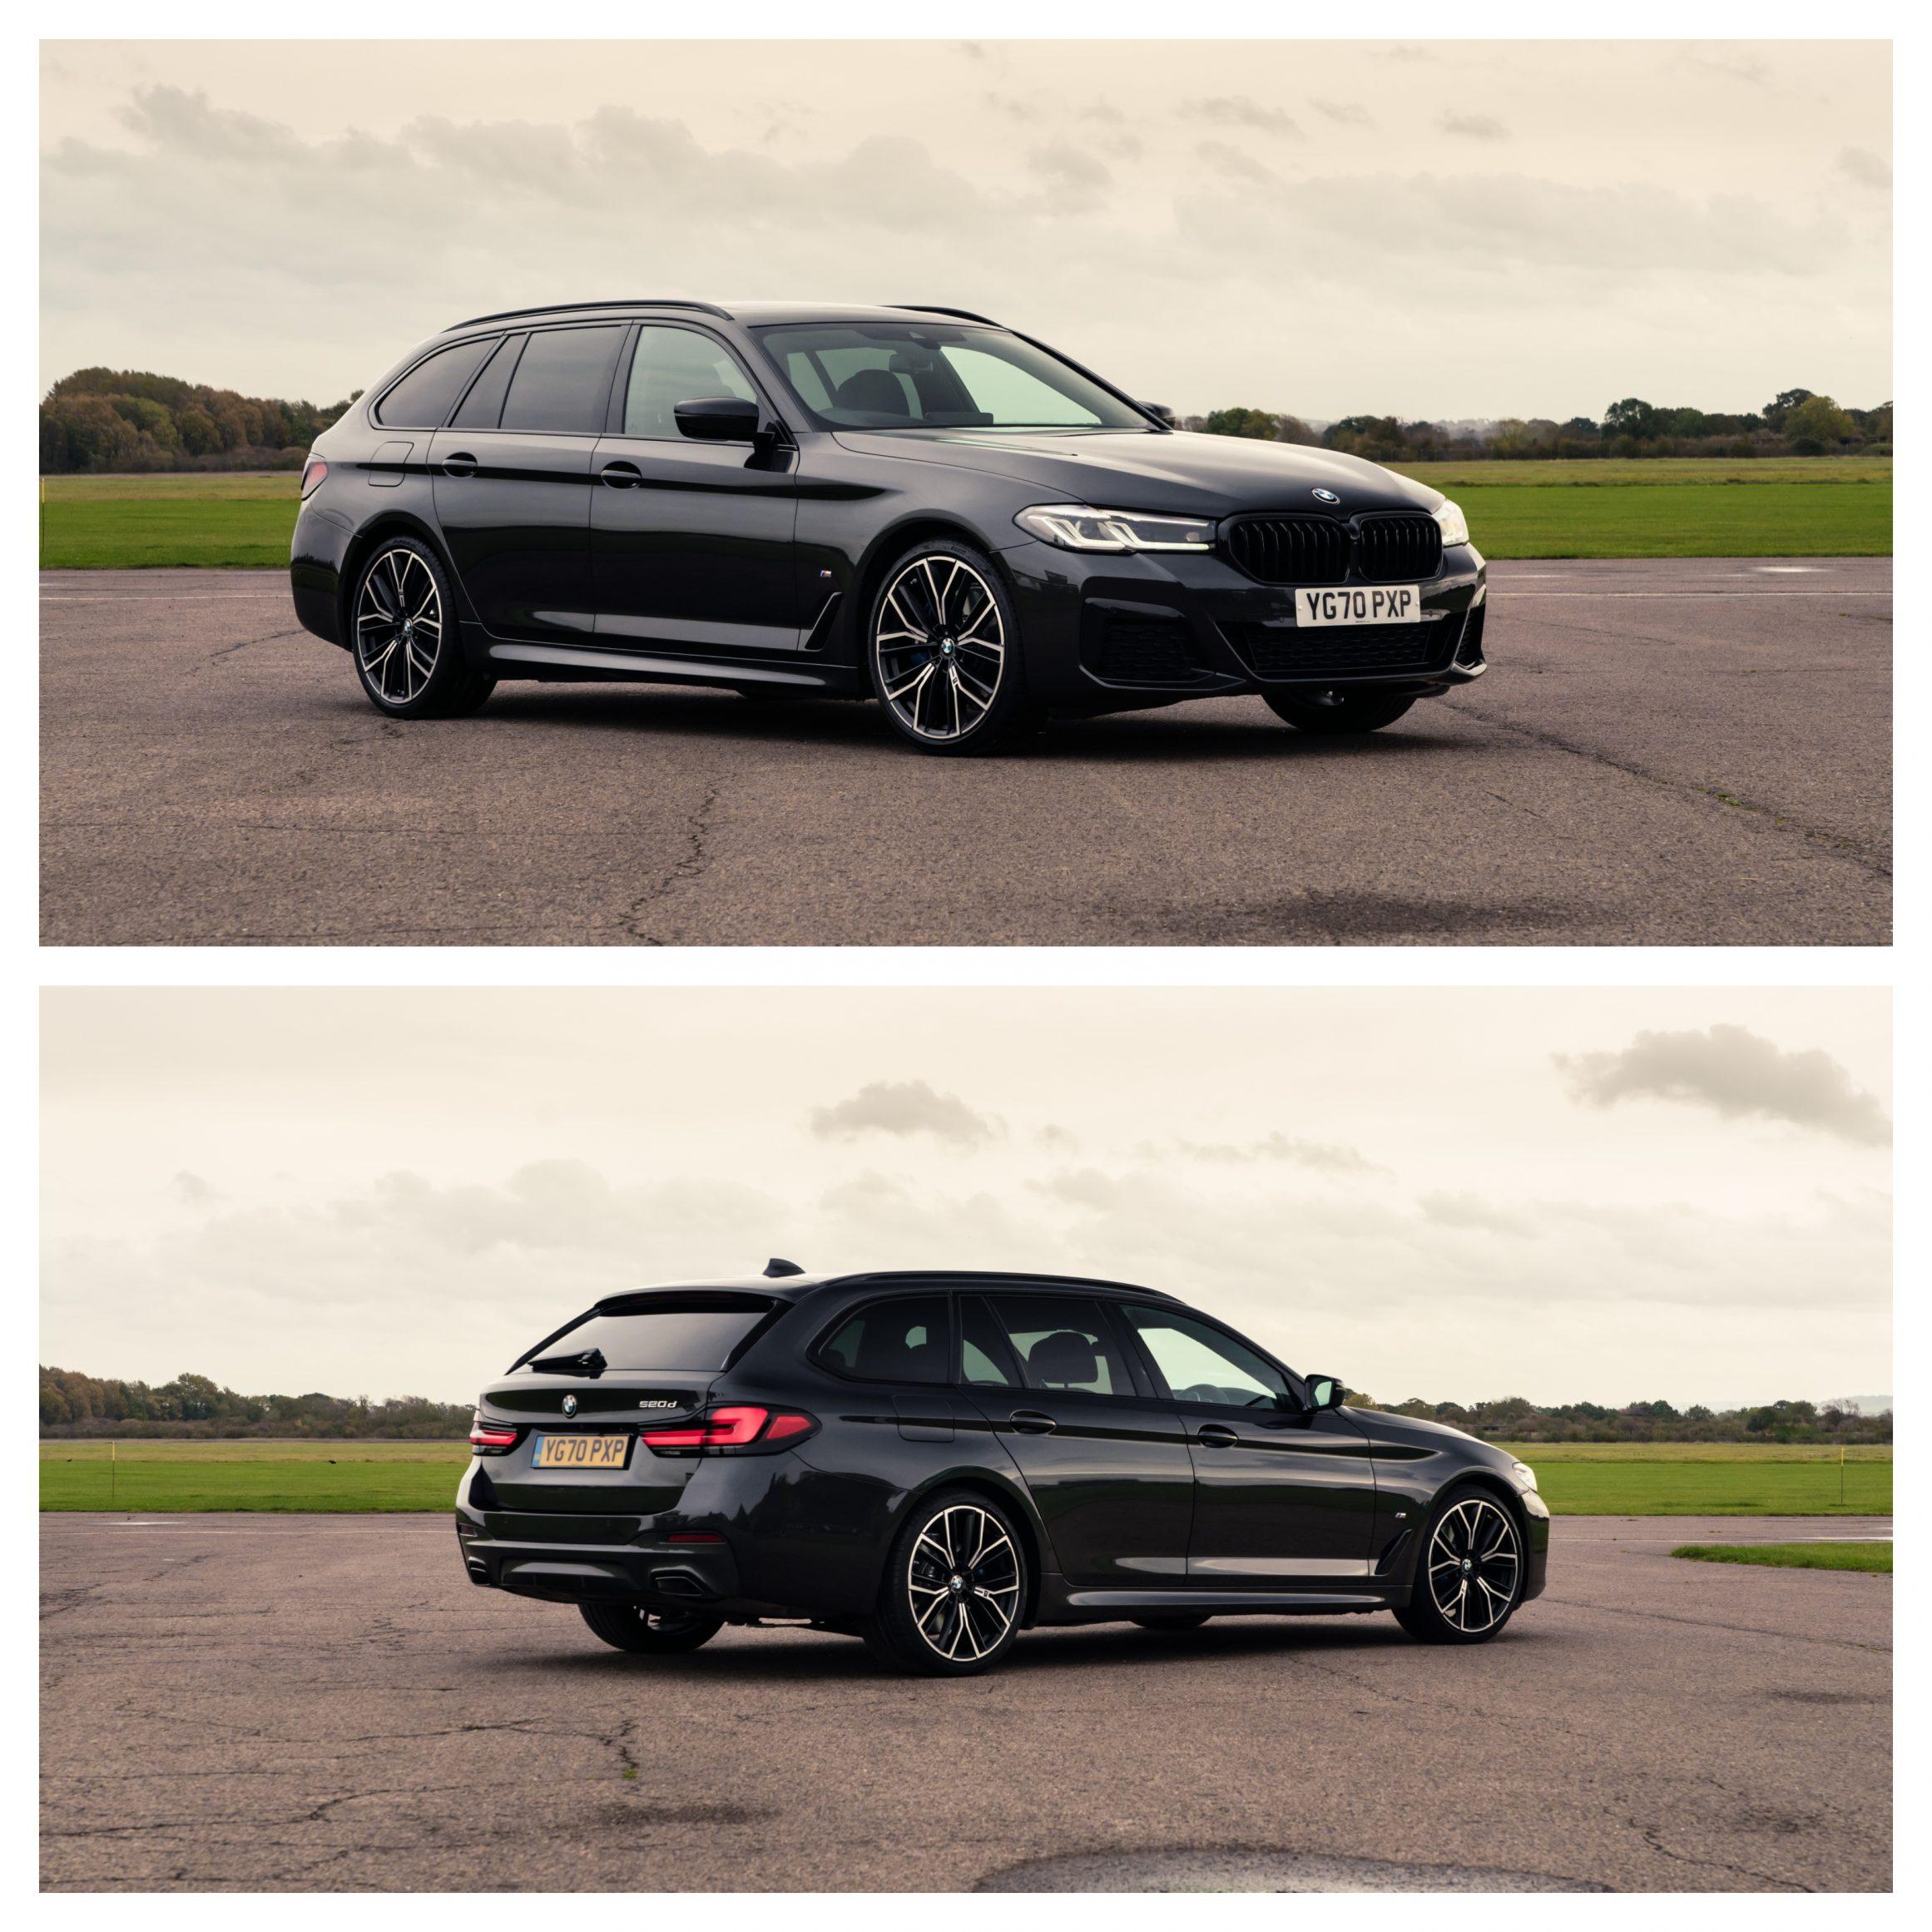 Best estate cars - BMW 5 Series Touring